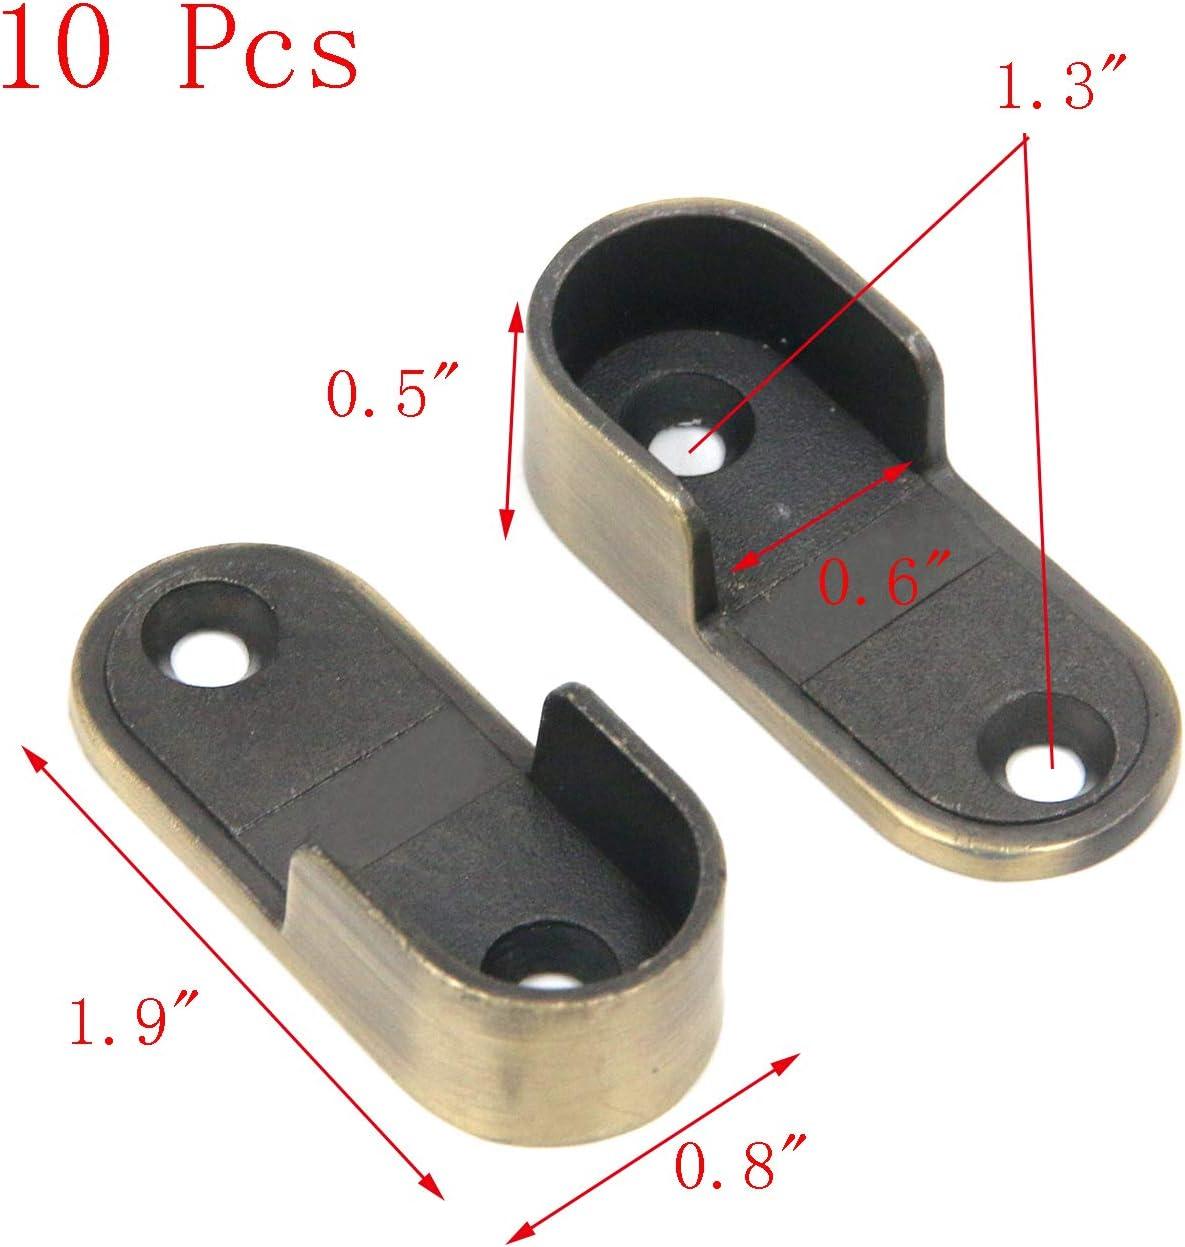 Geesatis 10 Pcs Bronze Curtain Rod Support Bracket Mount Shelf Flange Socket Holders with Mounting Screws 1.9 x 0.5